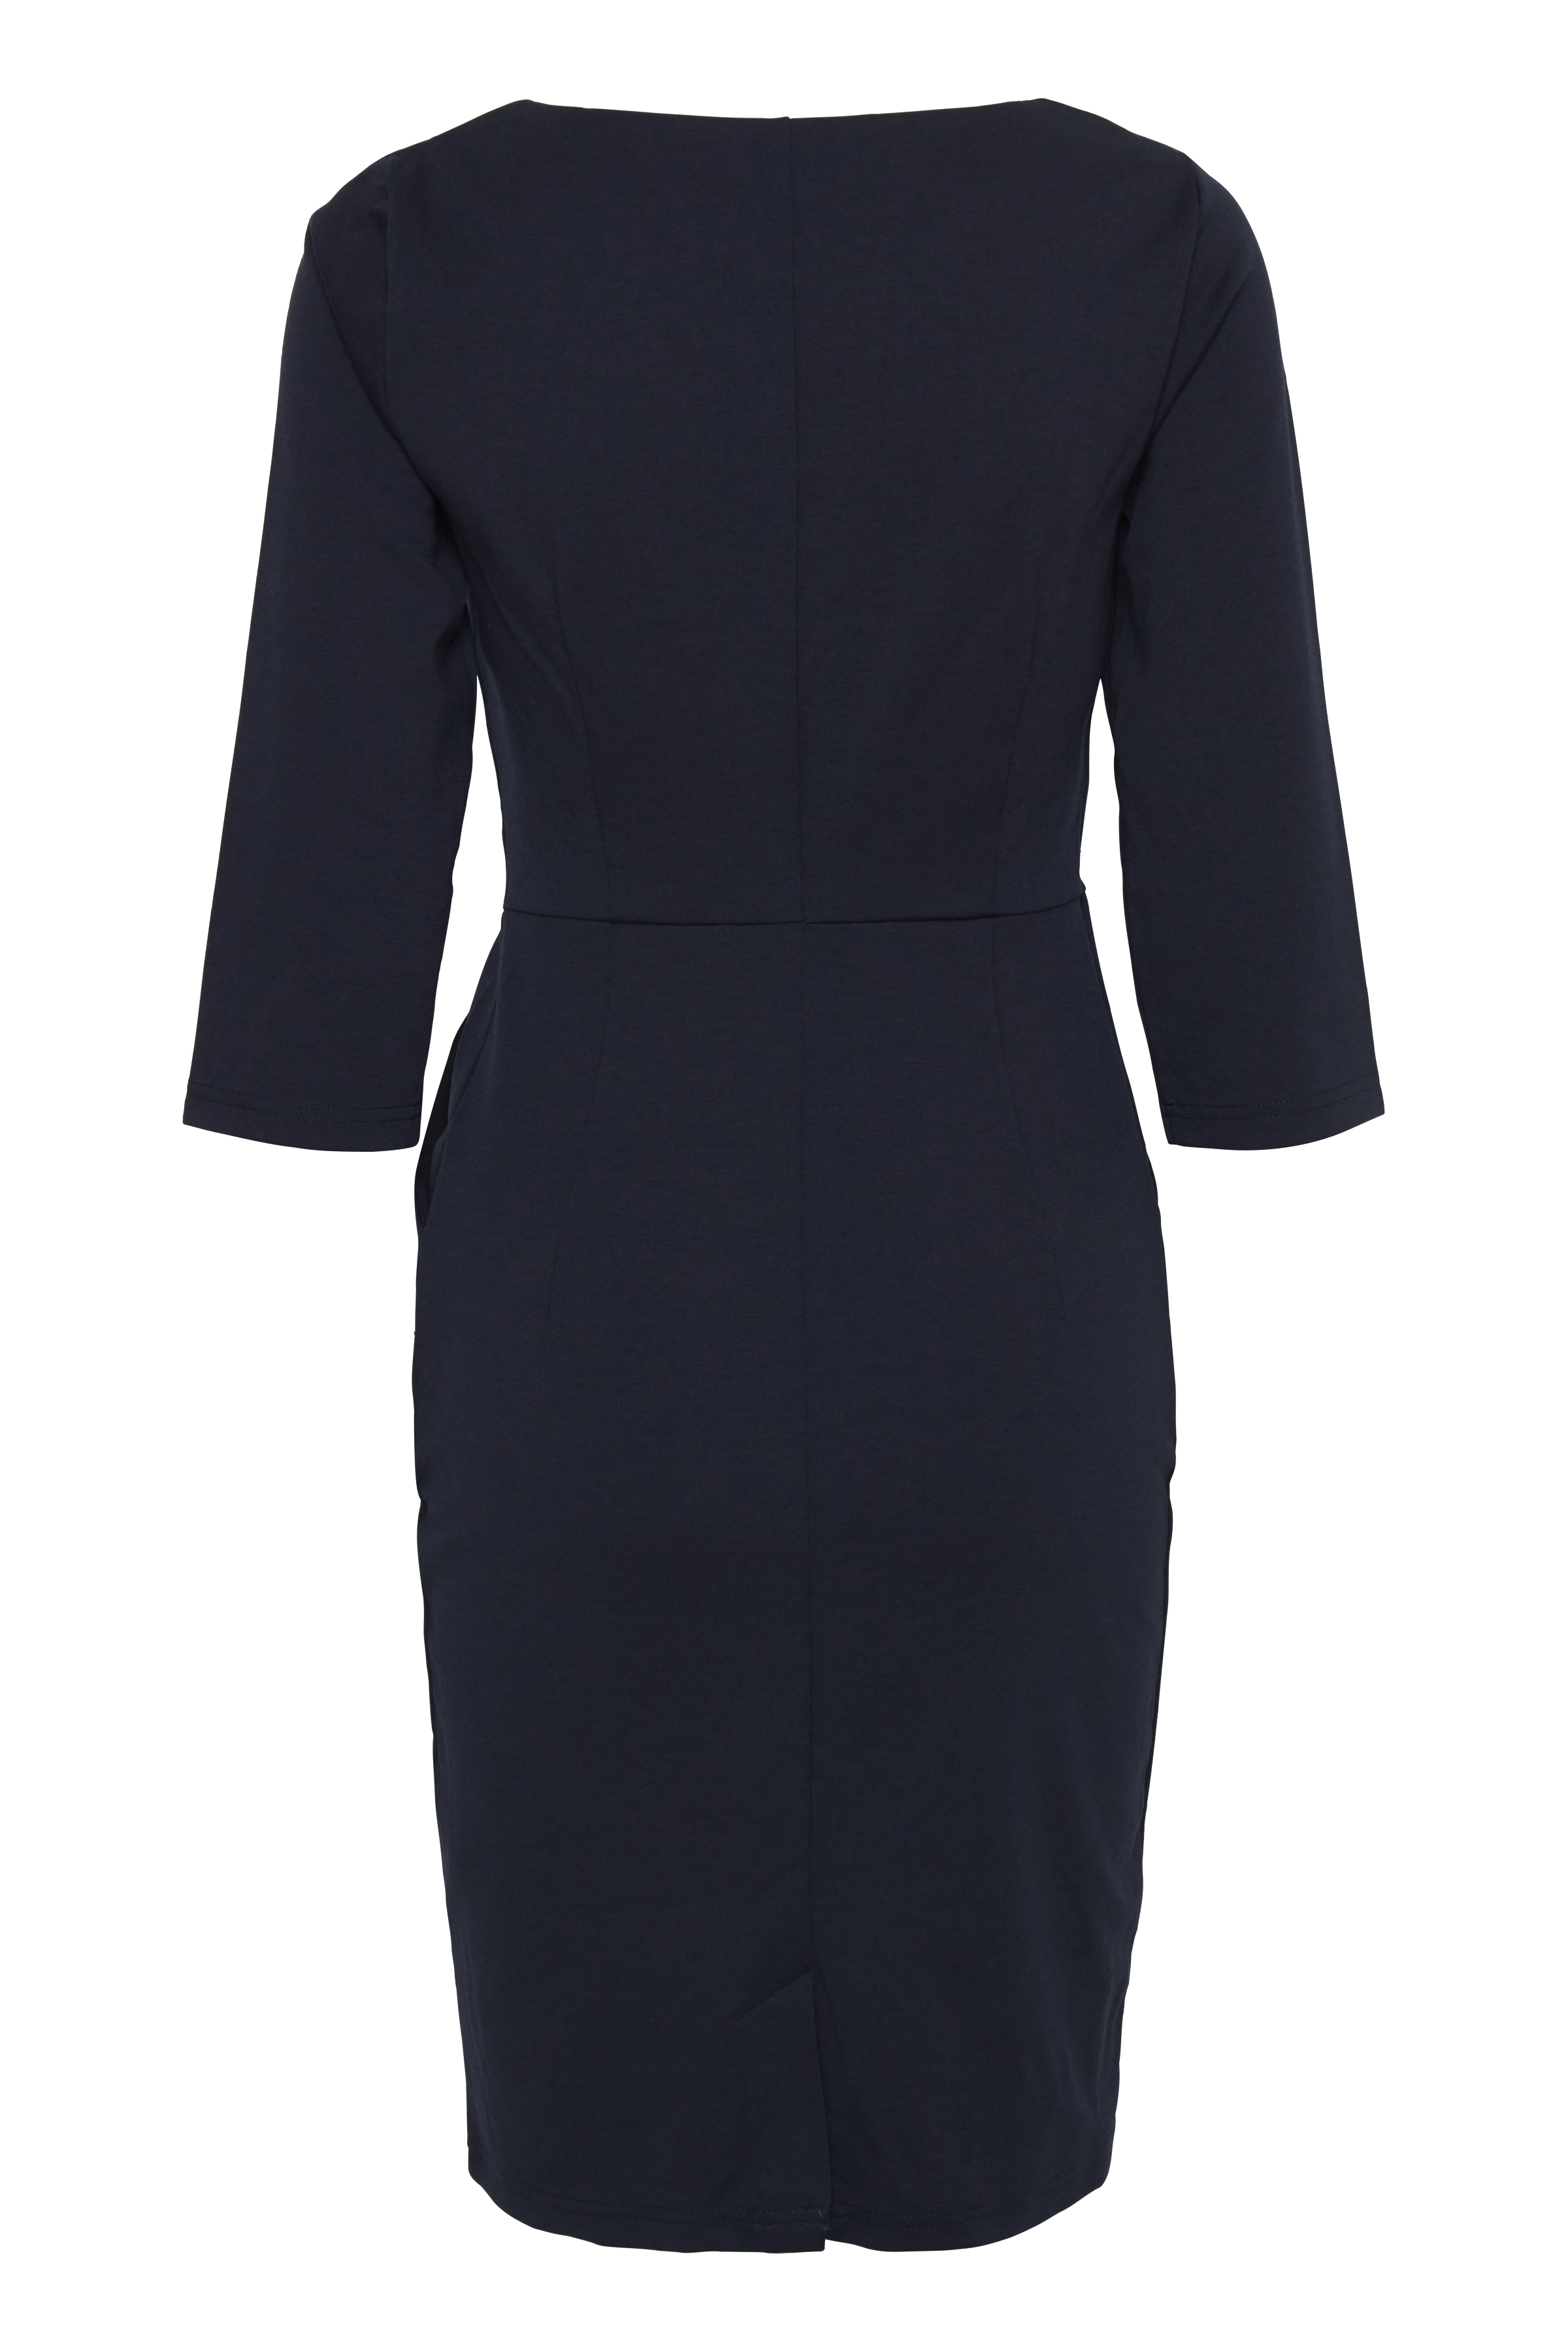 Total Eclipse Jerseykjole – Køb Total Eclipse Jerseykjole fra str. XS-XXL her